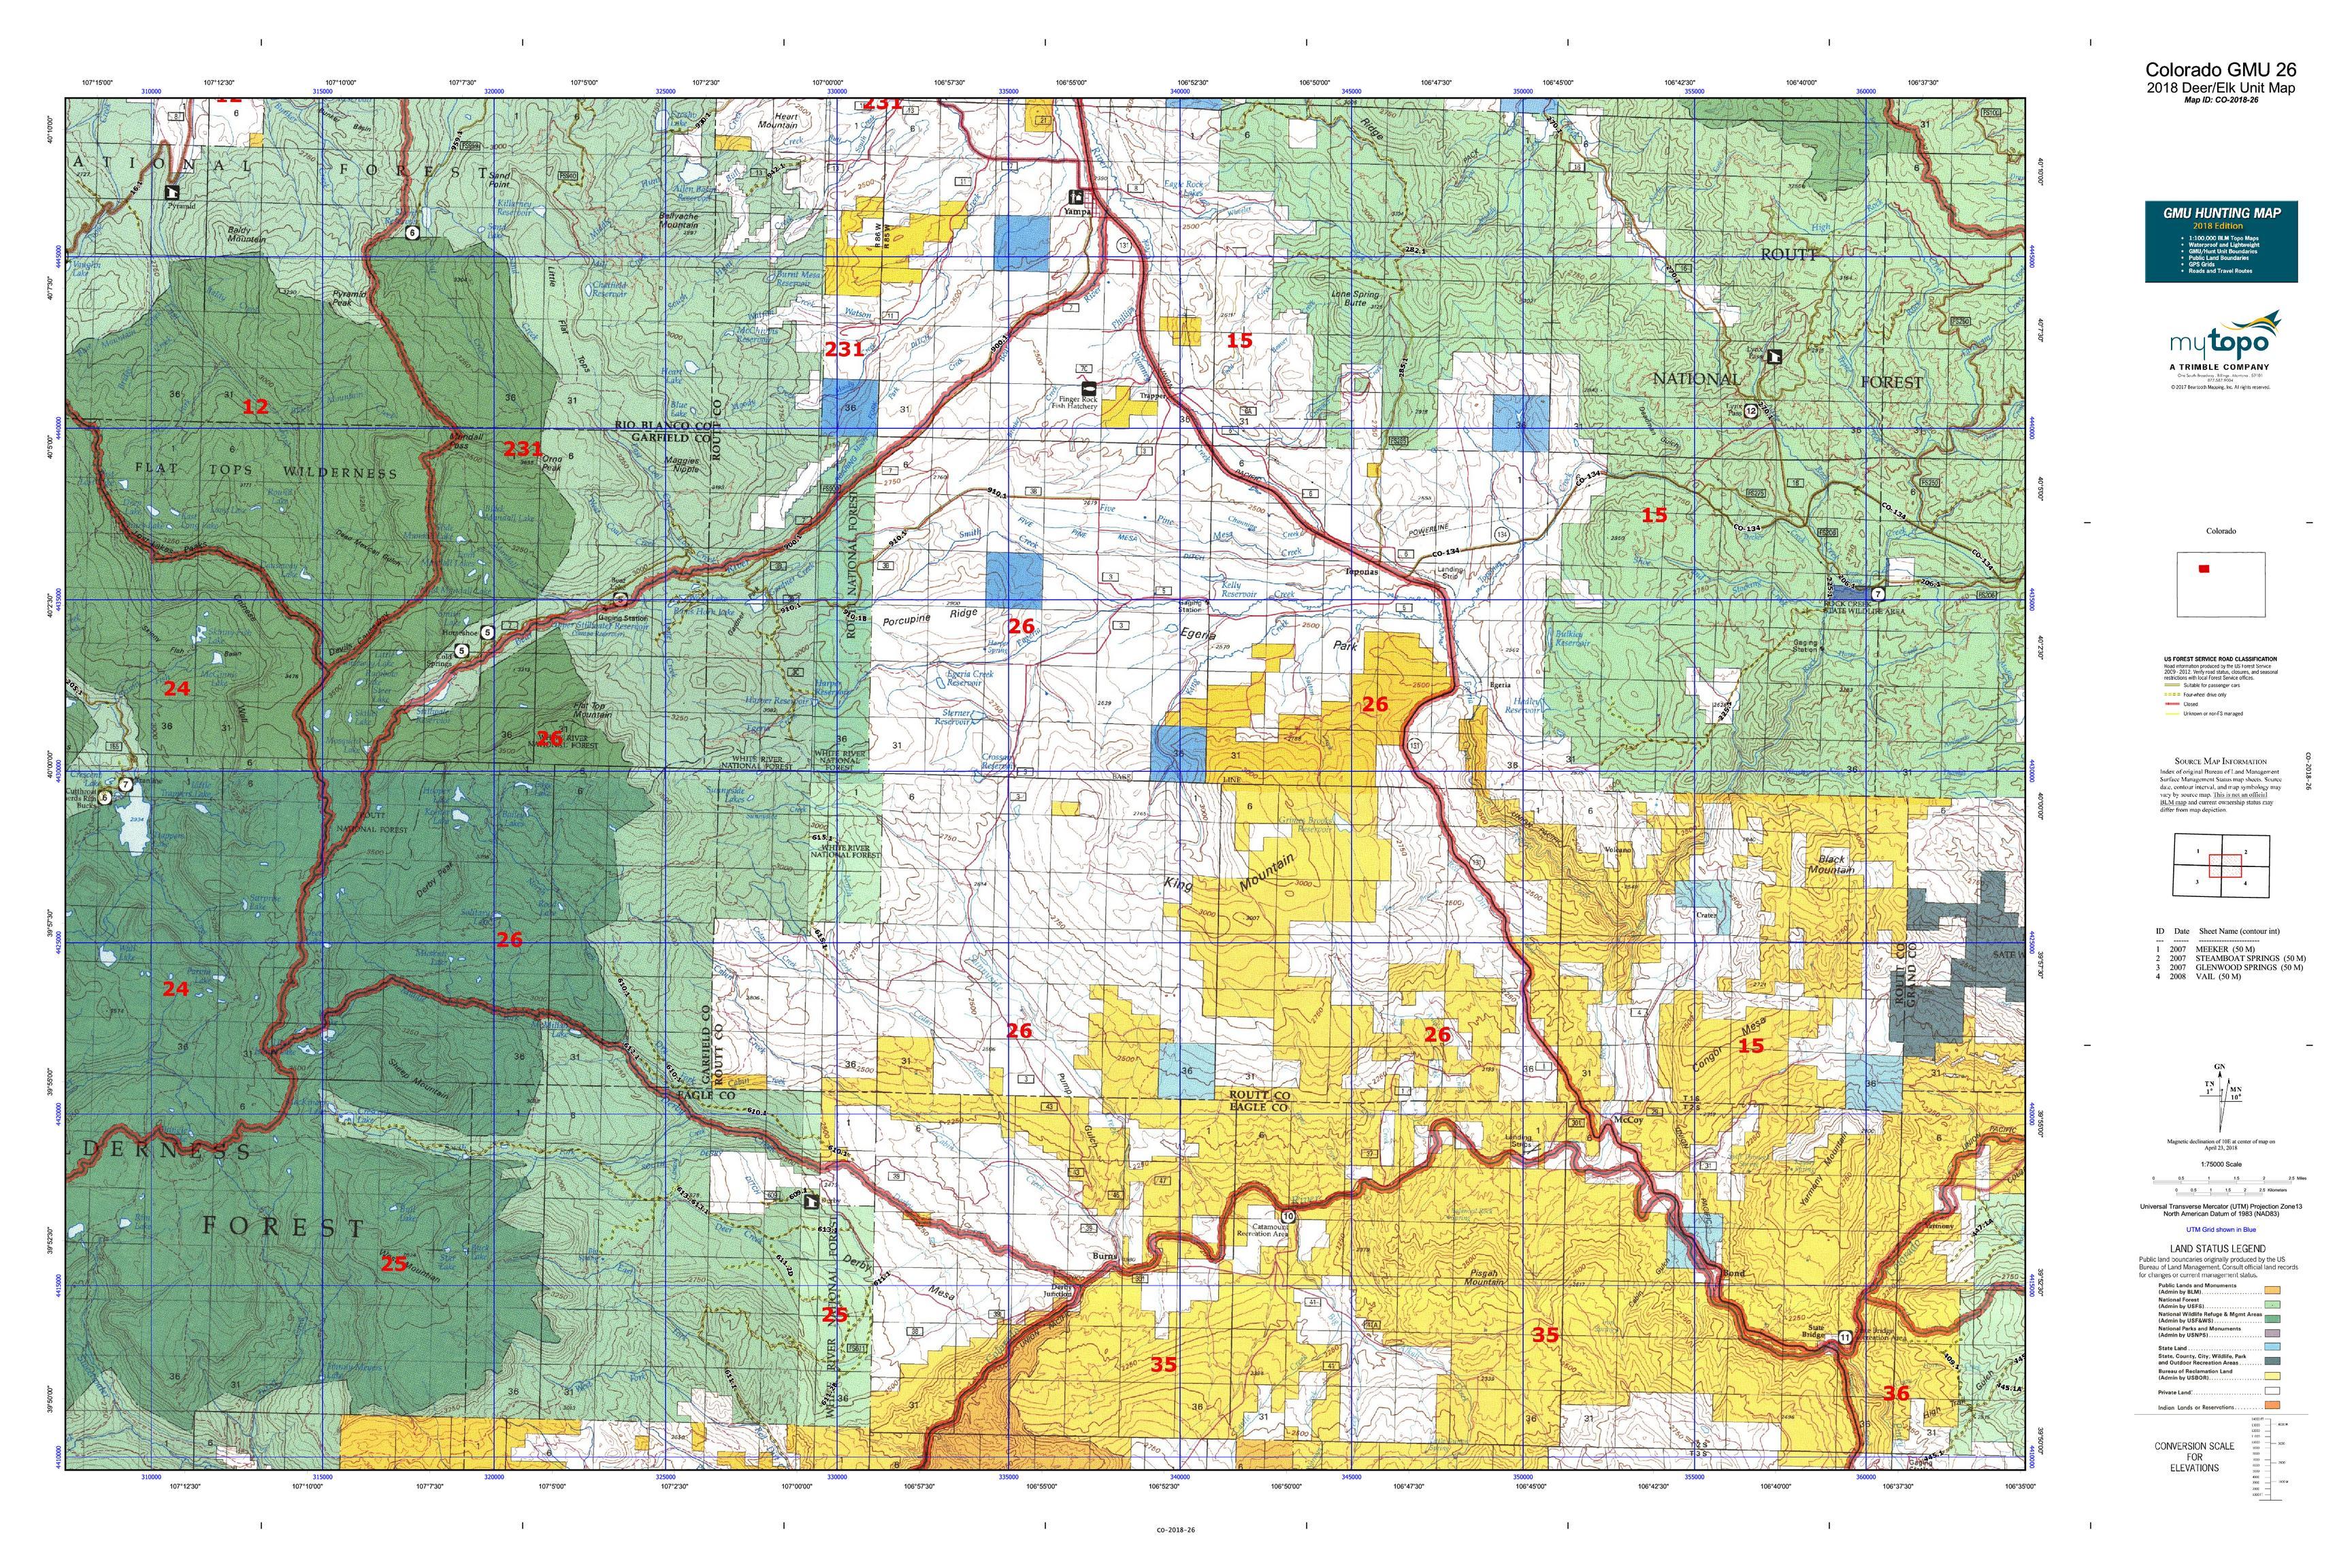 Colorado GMU 26 Map | MyTopo